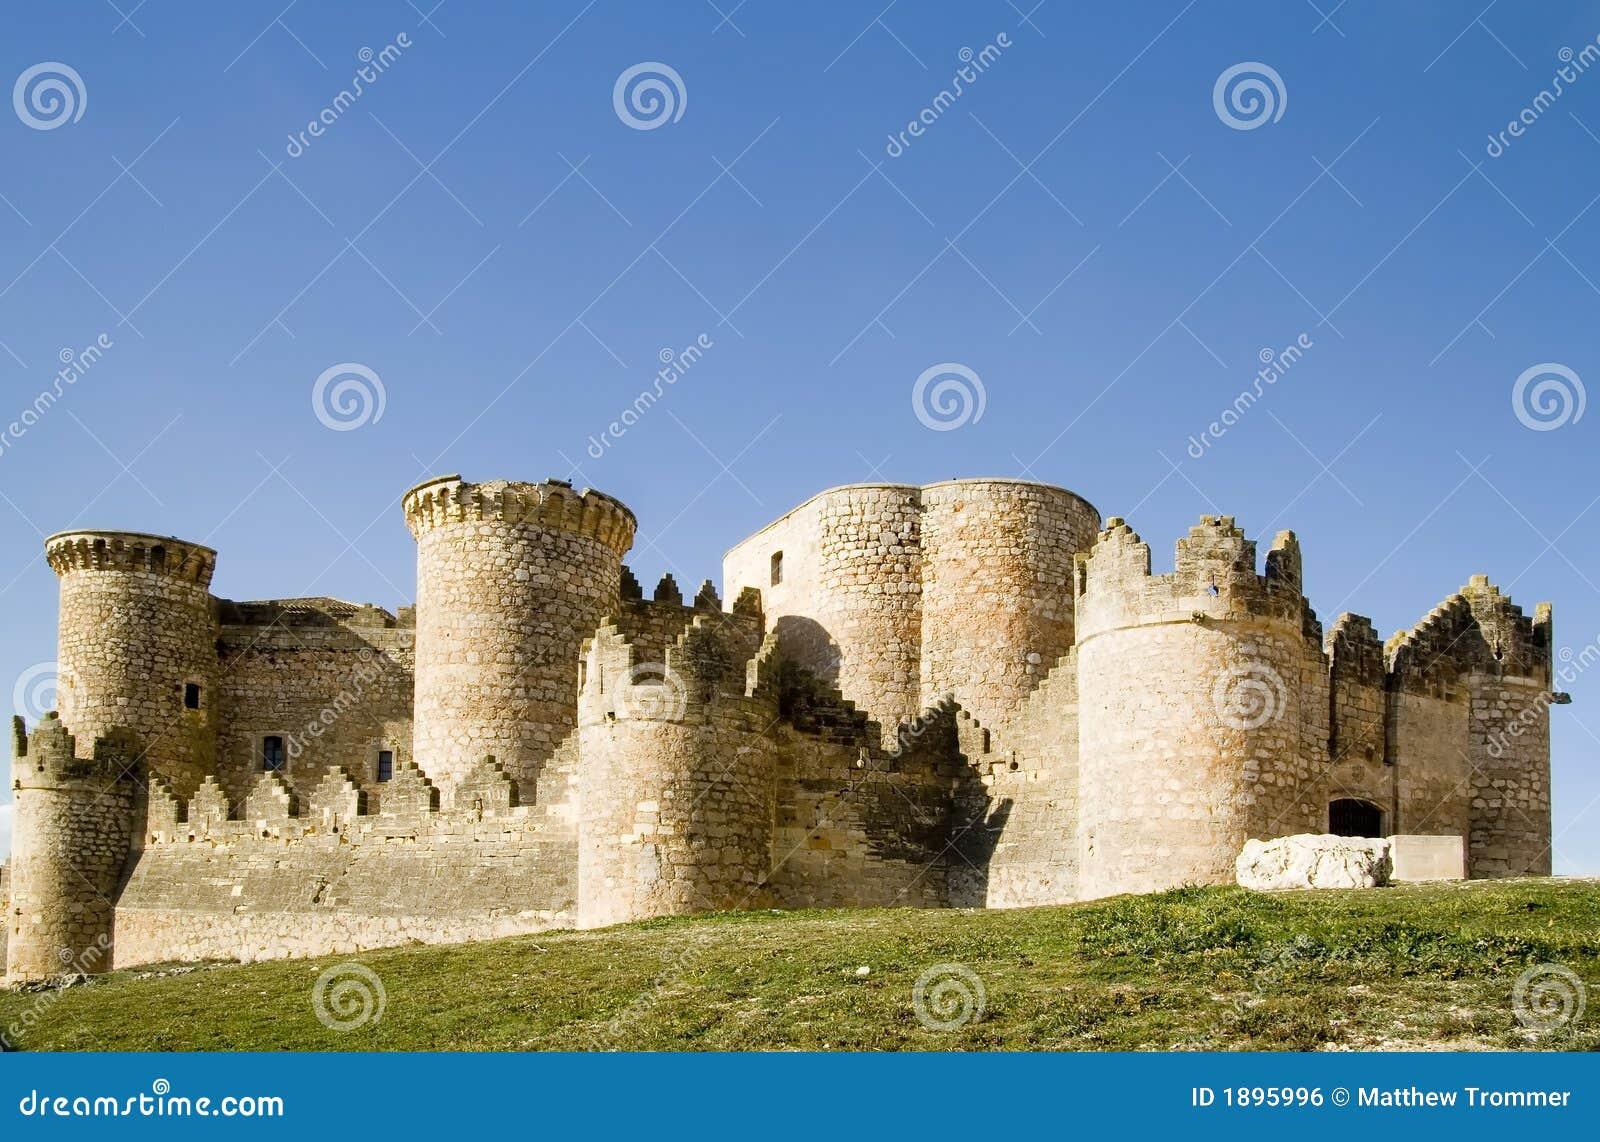 Fortificazione medioevale